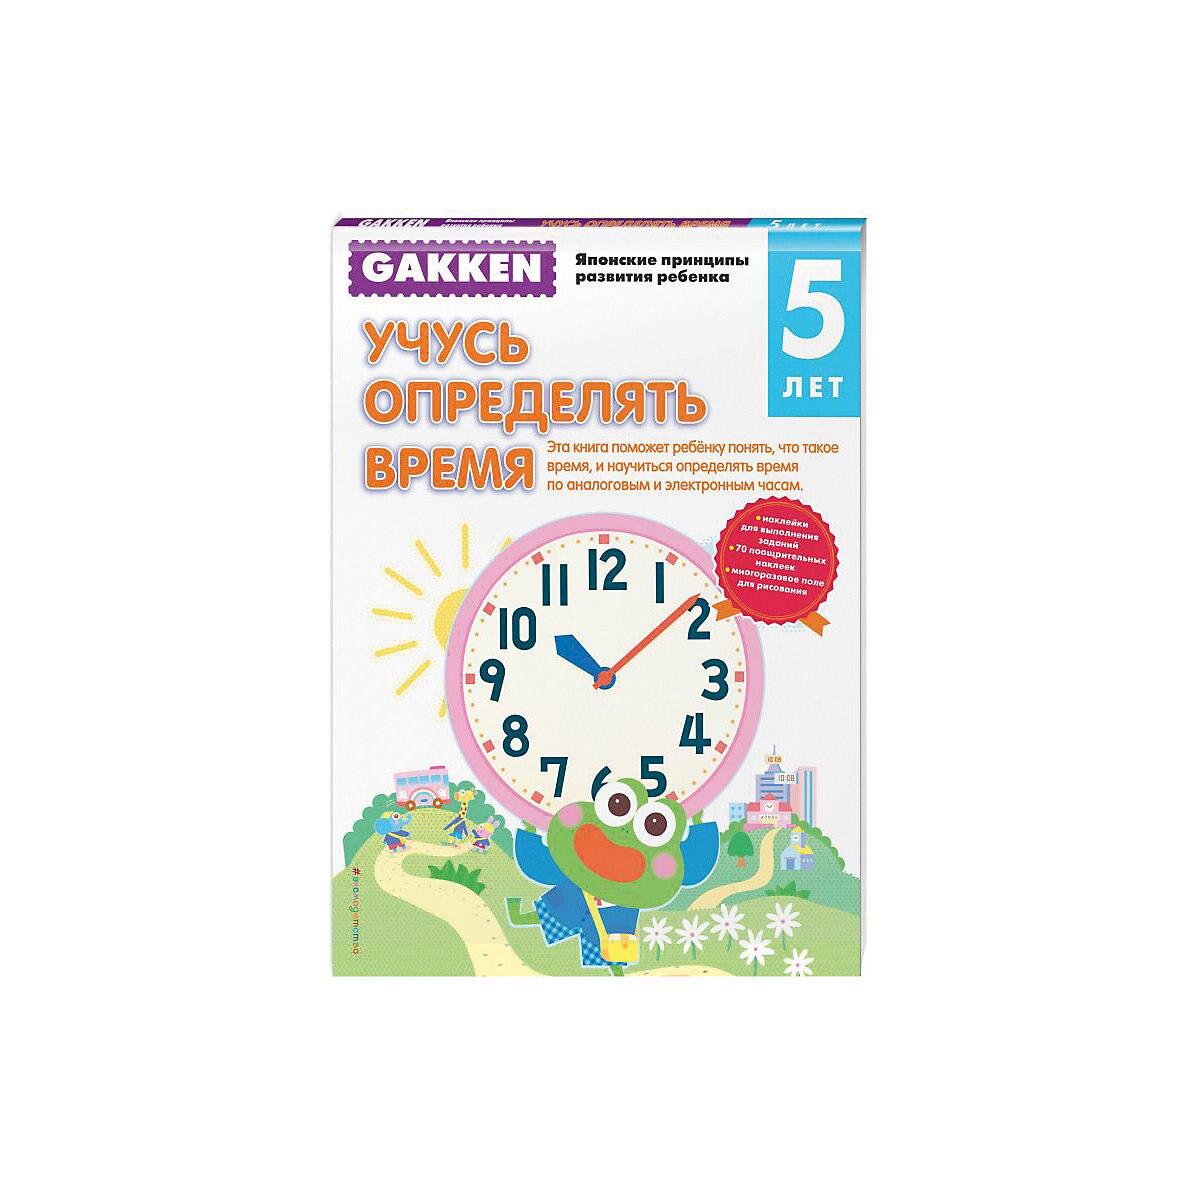 Books EKSMO 9160276 Children Education Encyclopedia Alphabet Dictionary Book For Baby MTpromo